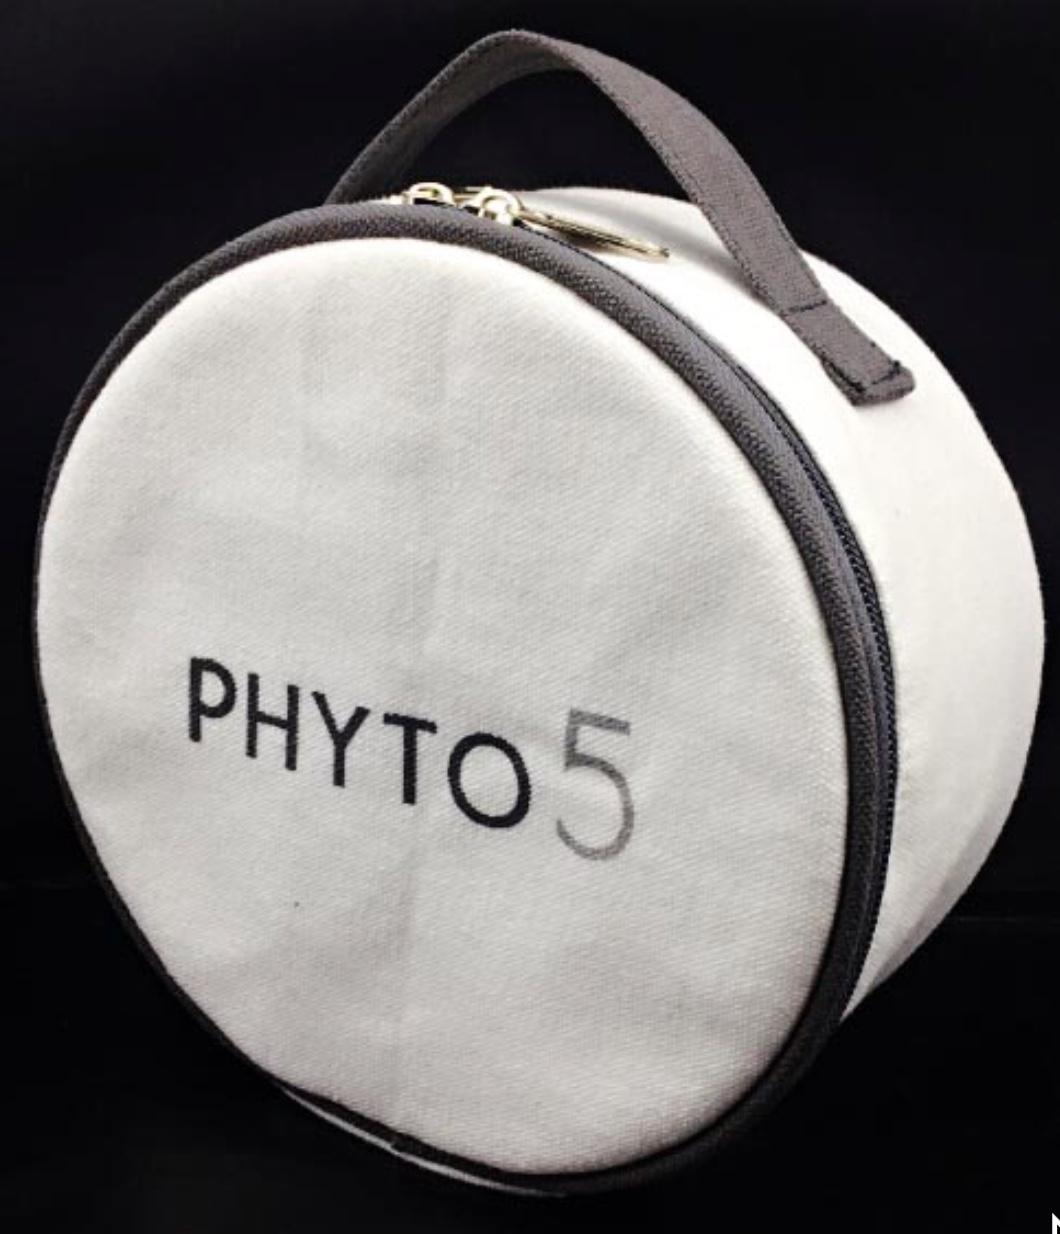 phyto5_canvas_kit.jpg